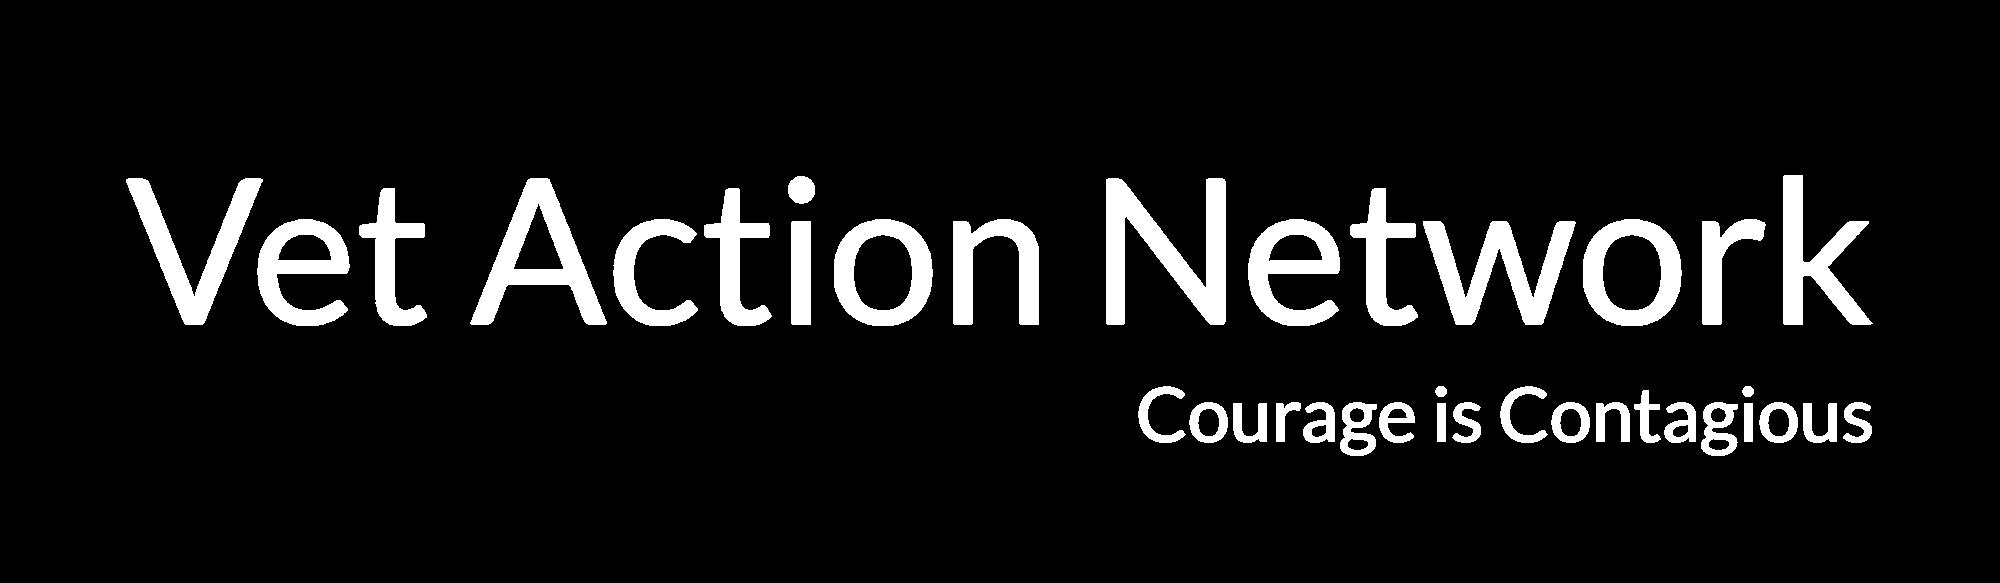 Vet Action Network-logo-white copy.png